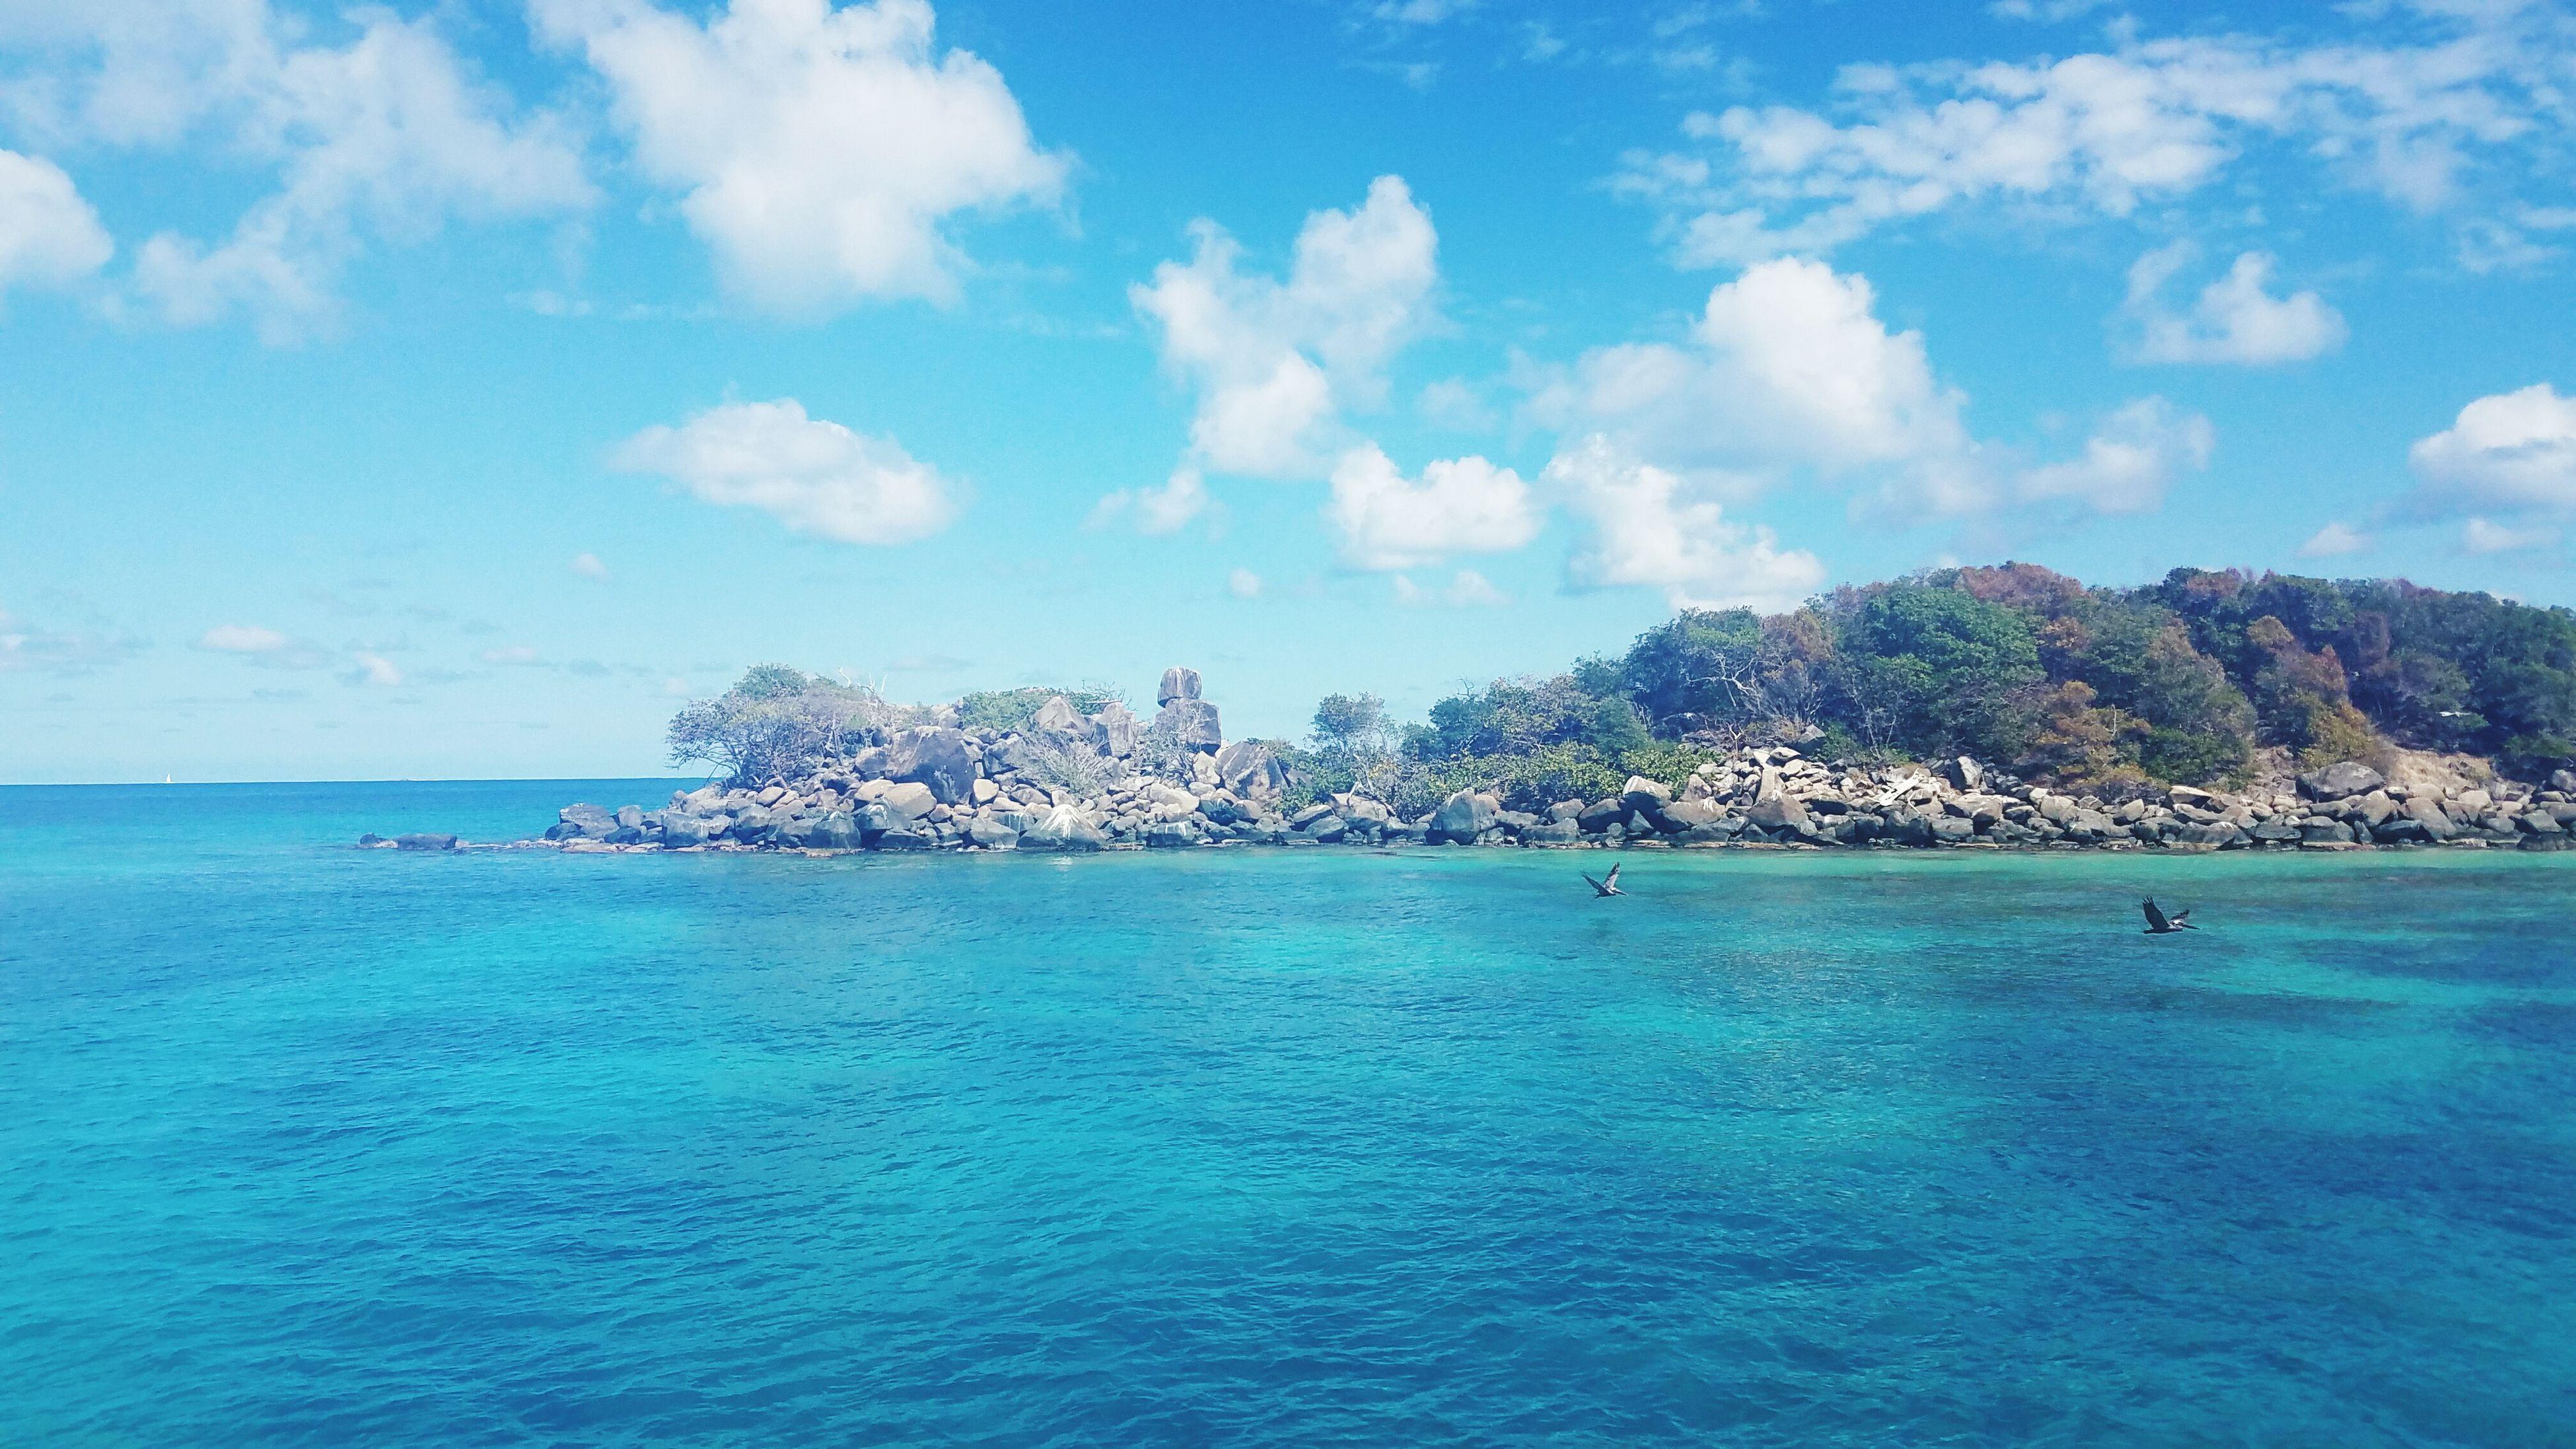 shades of blue. Wanderlust Globetrotter Naturephotography Puerto Rico Islapalomino Sea Travel Destinations